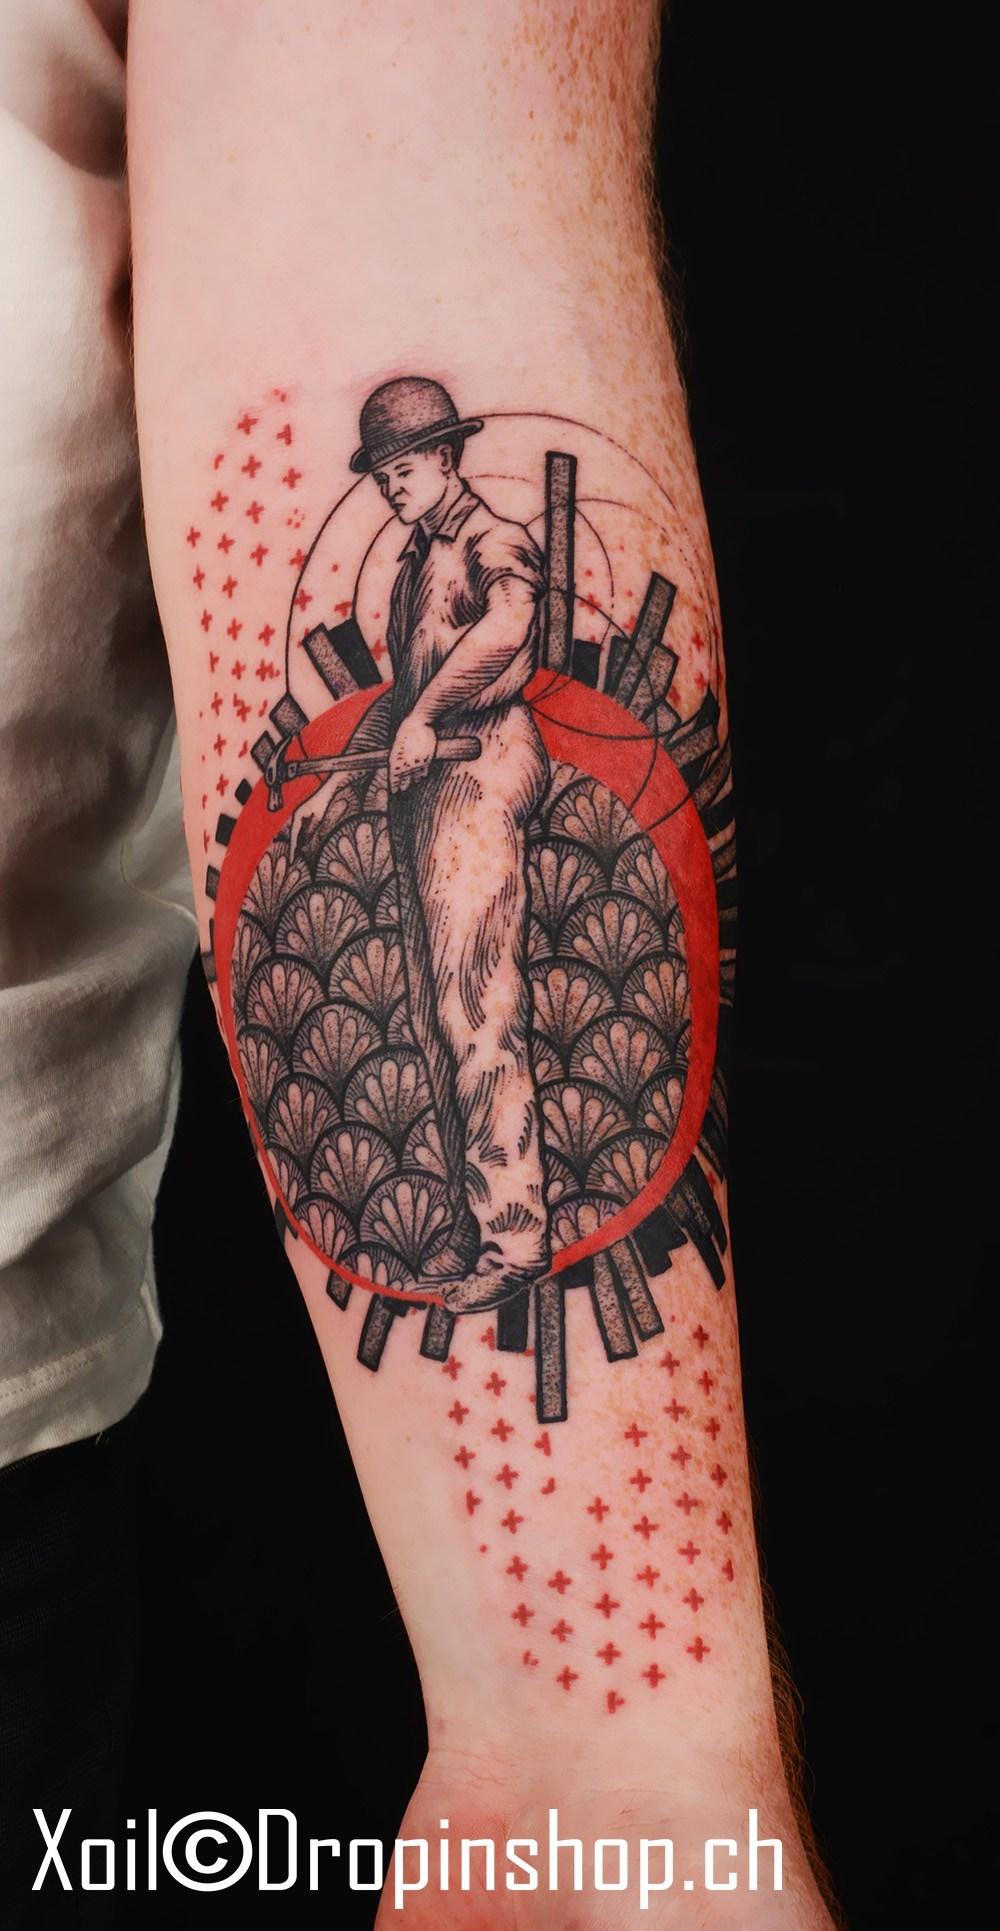 20-05-16-james-mason-gentelman-pattern-avbras-xoil-tattoo-2016.jpg